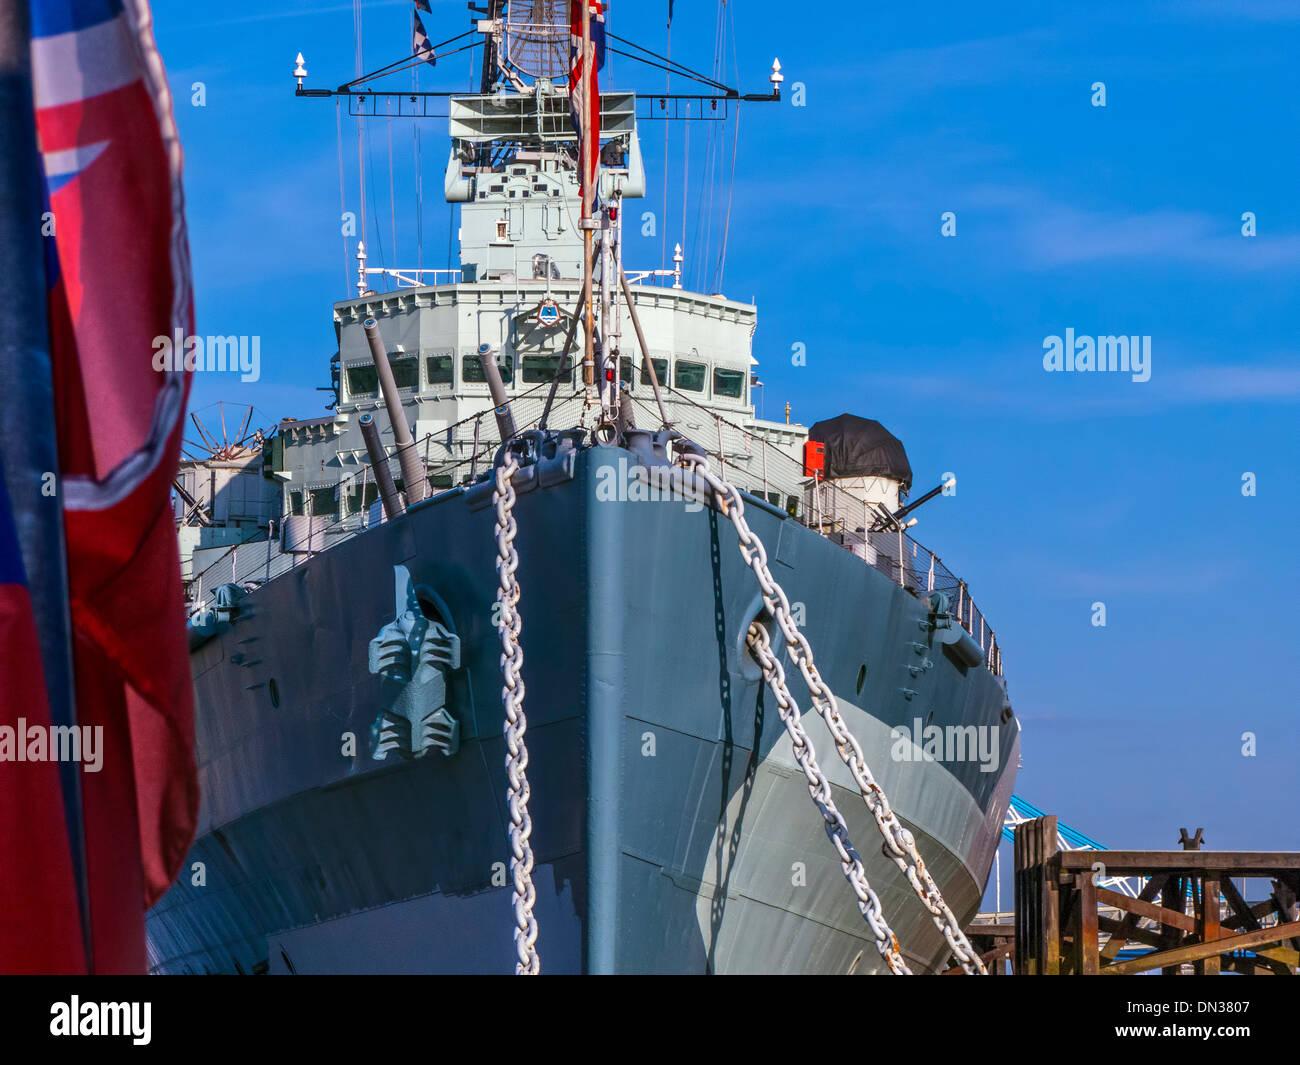 HMS Belfast, London - Stock Image